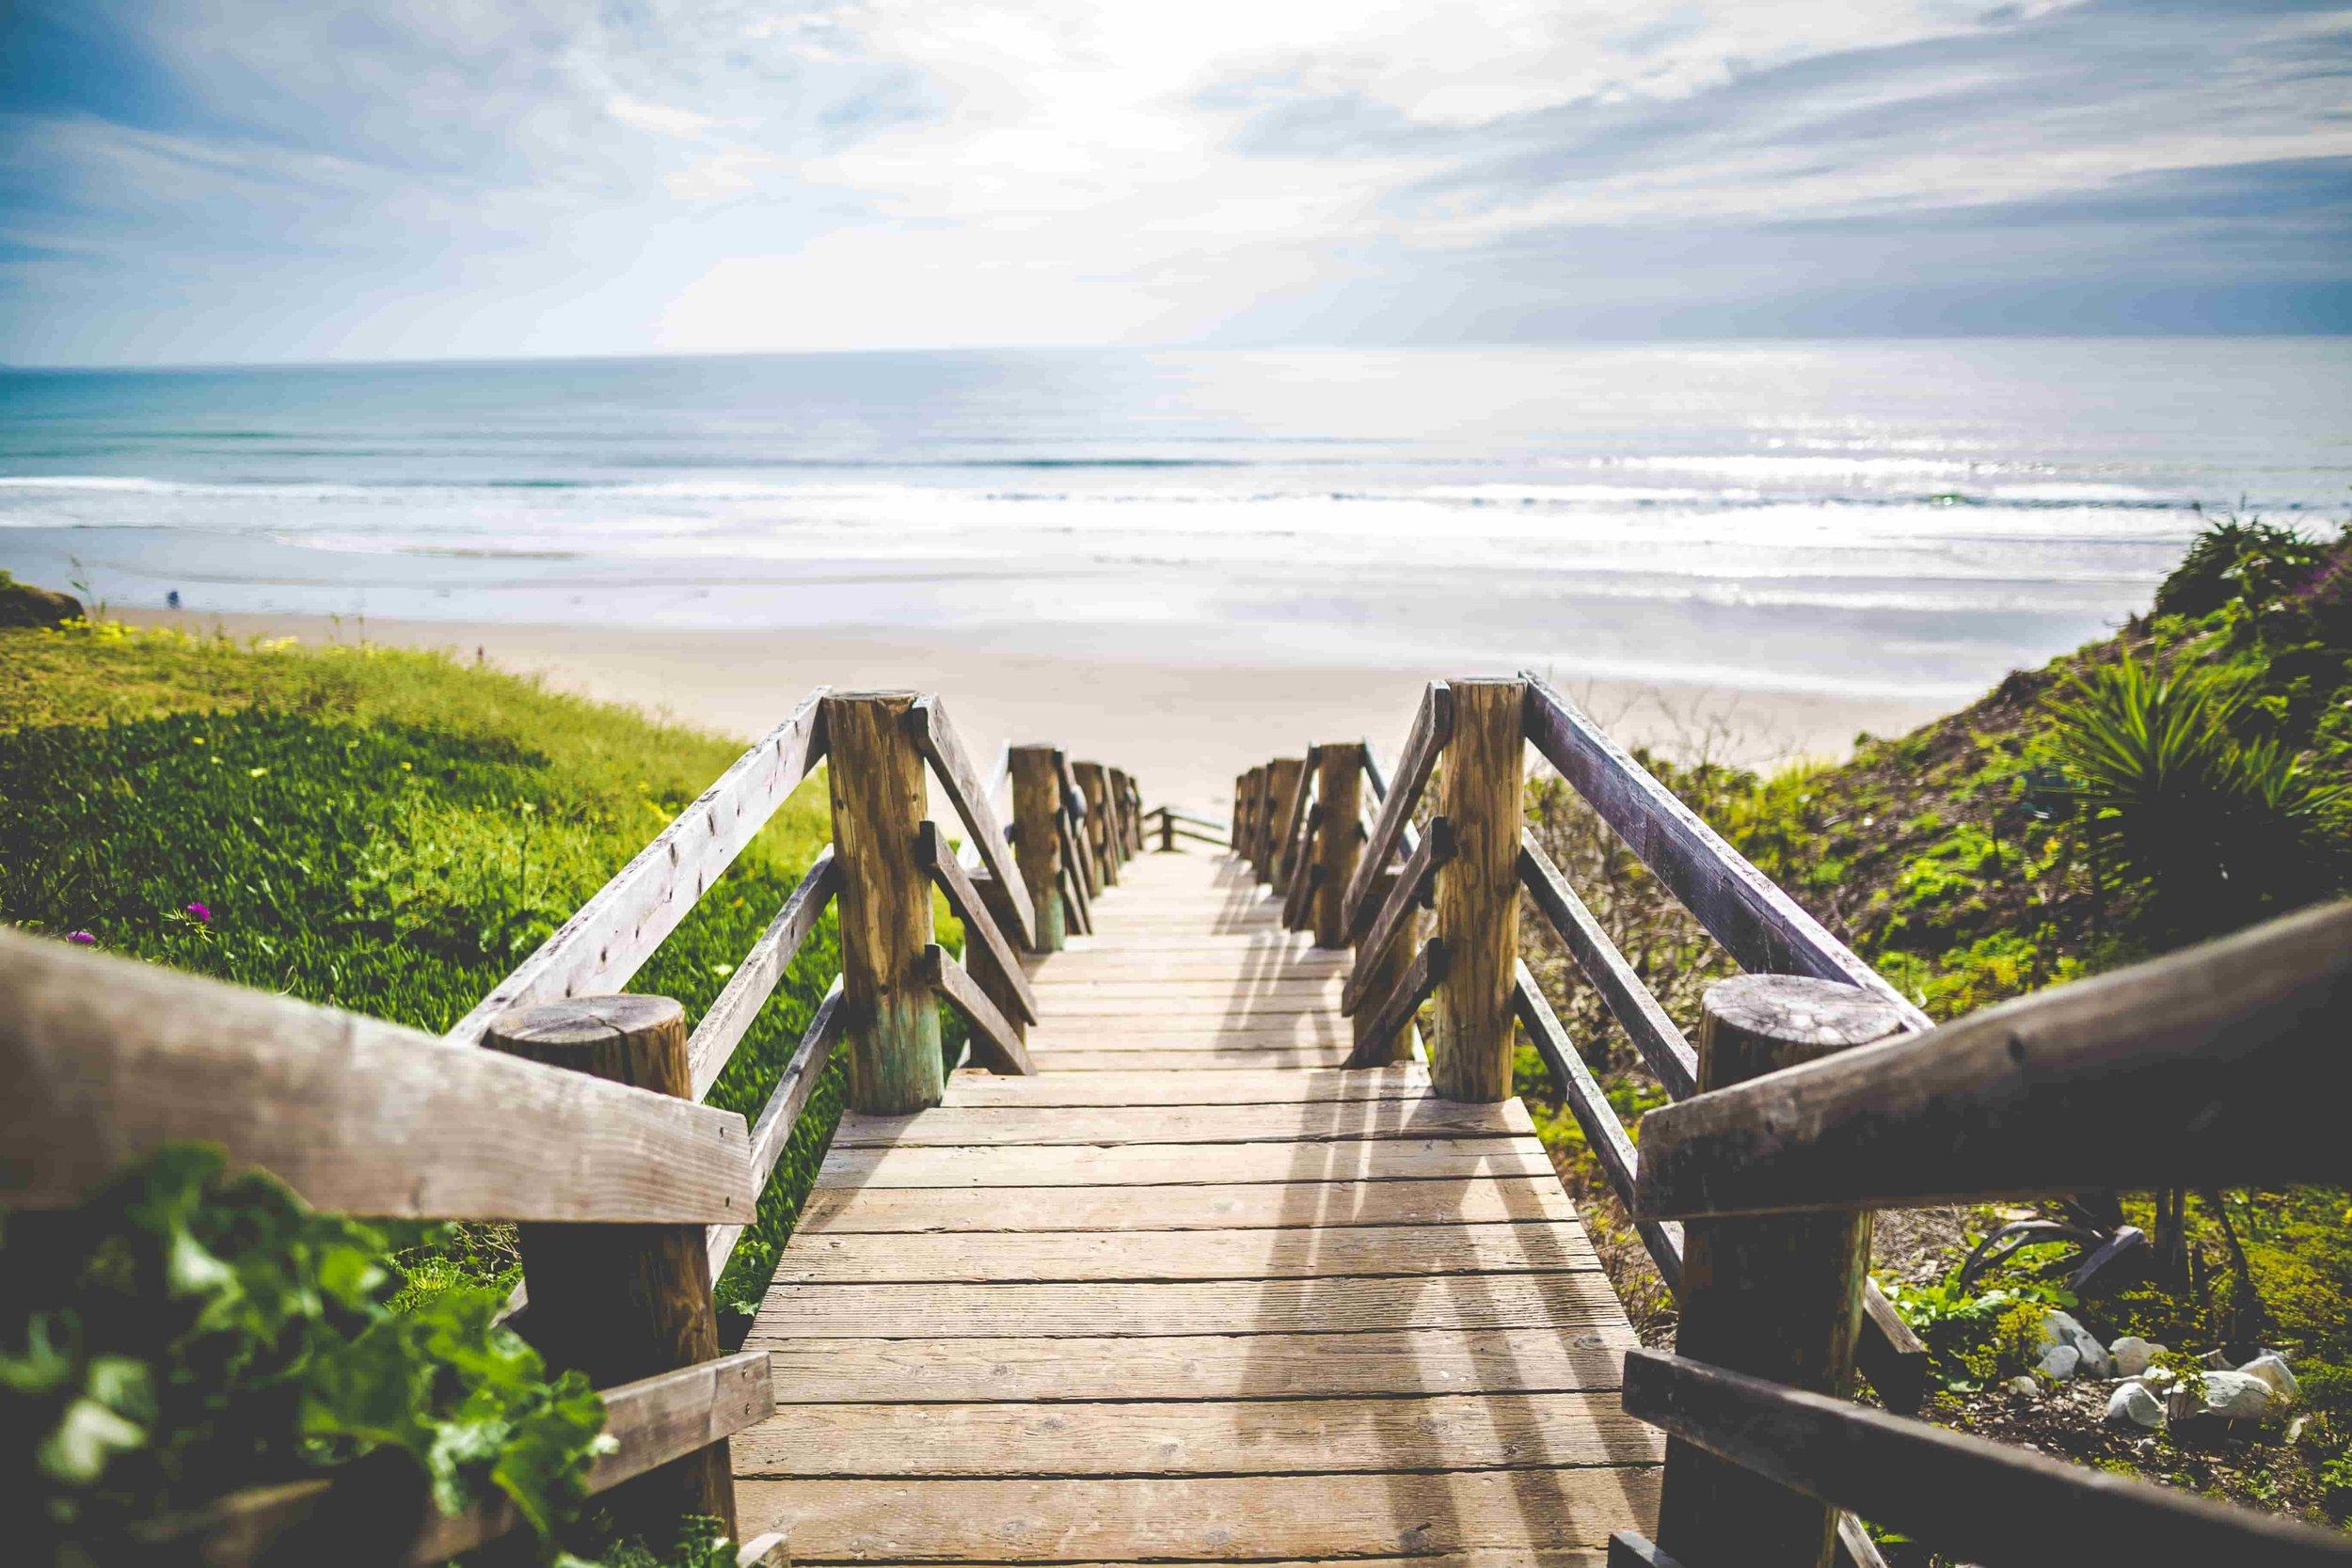 10 eco-friendly beach essentials from www.goingzerowaste.com #ecofriendly #zerowaste #beach #beachbag #poolbag #essentials #